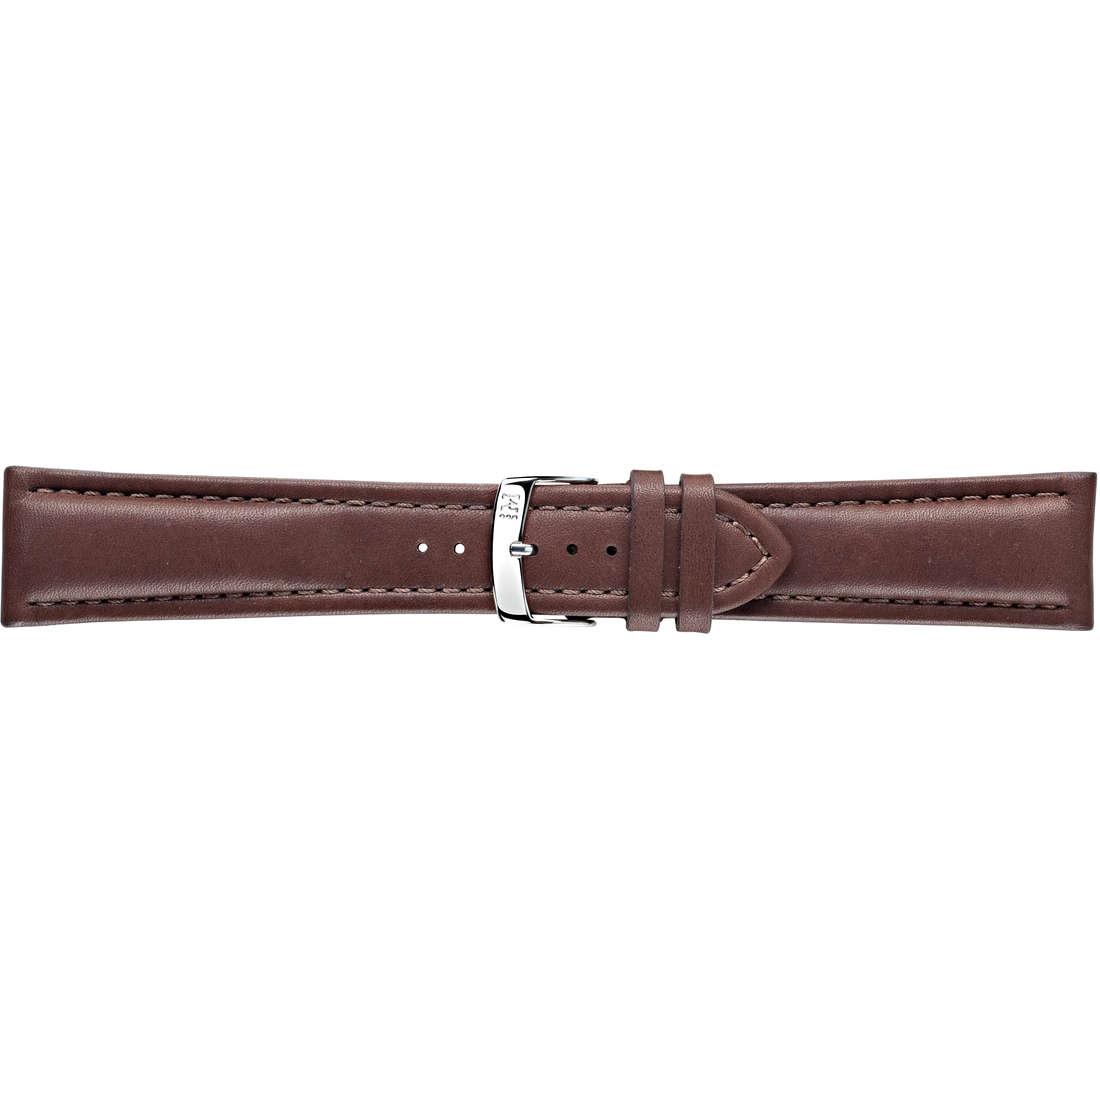 watch watch bands watch straps man Morellato Morellato 1930 A01U4026A37034CR22